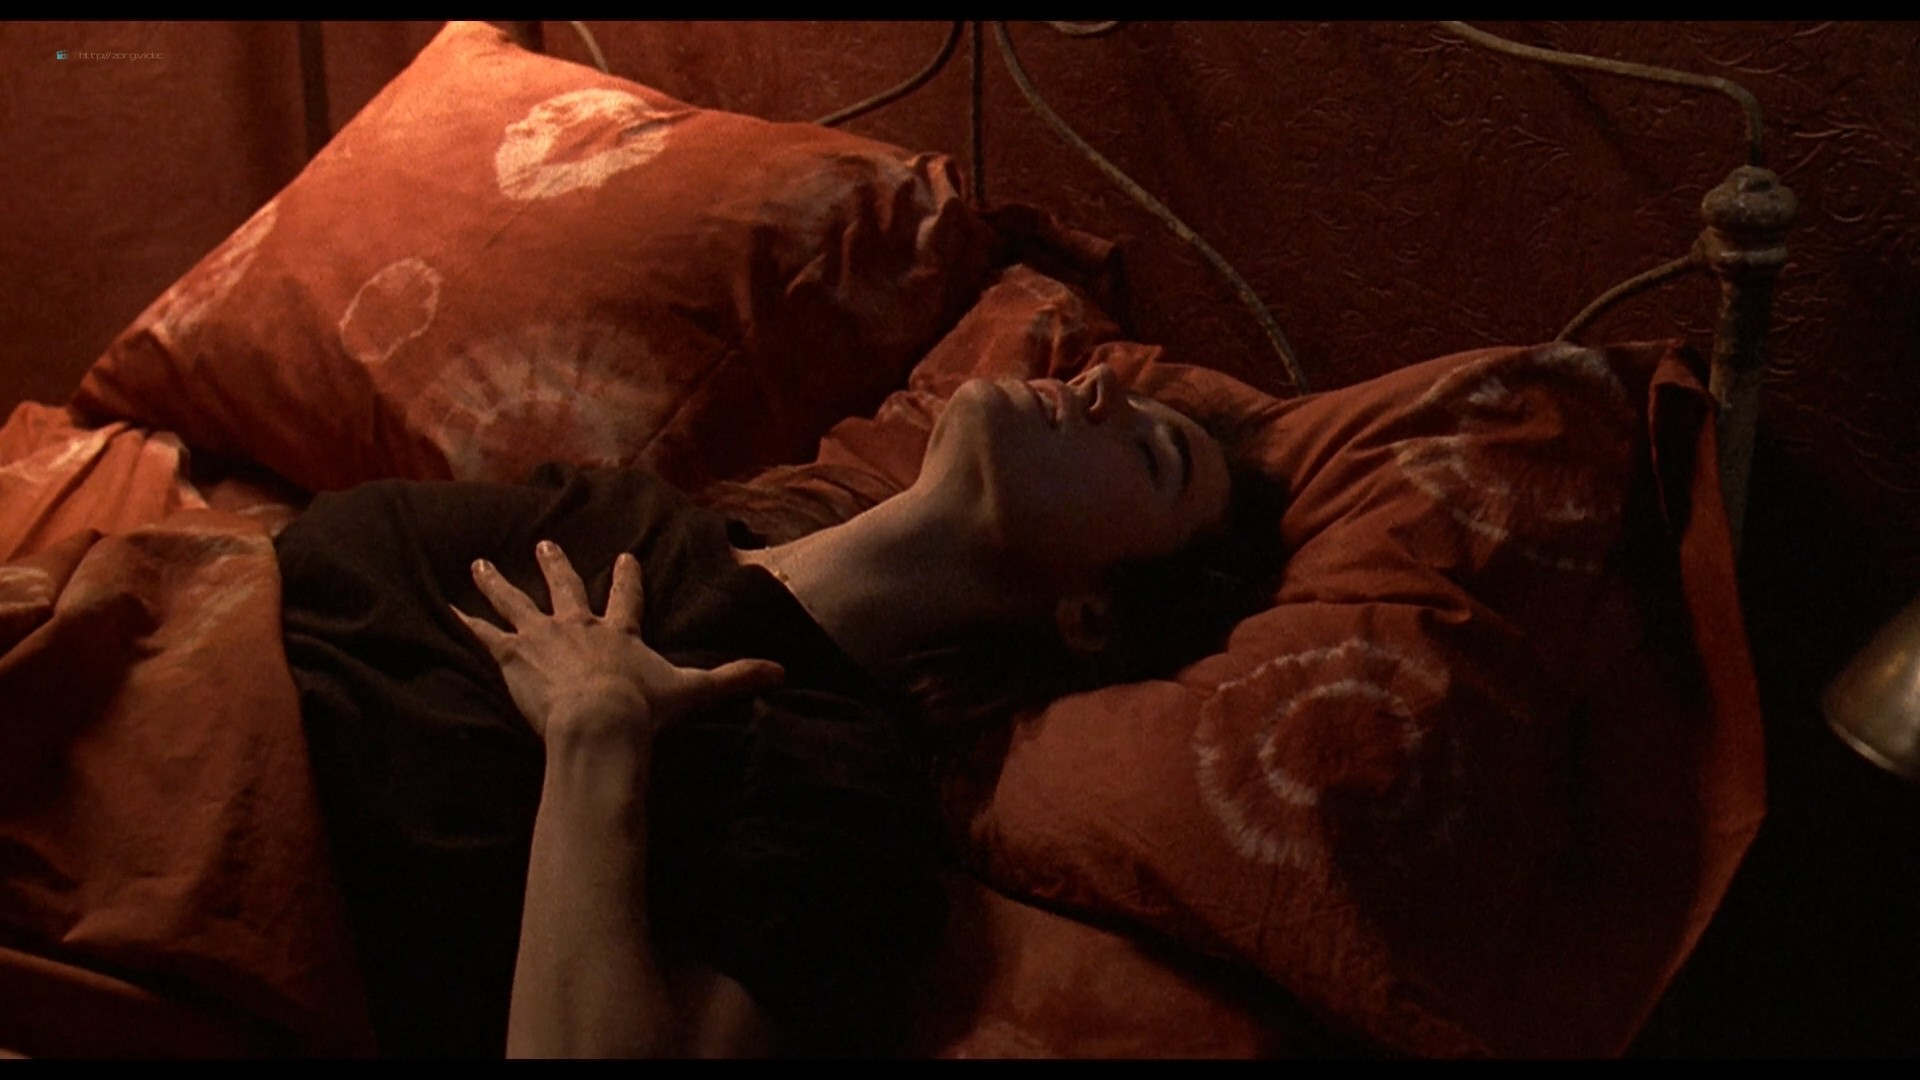 Jennifer Connelly nude side boob sex in – Waking the Dead (2000) HD 1080p BluRay (13)